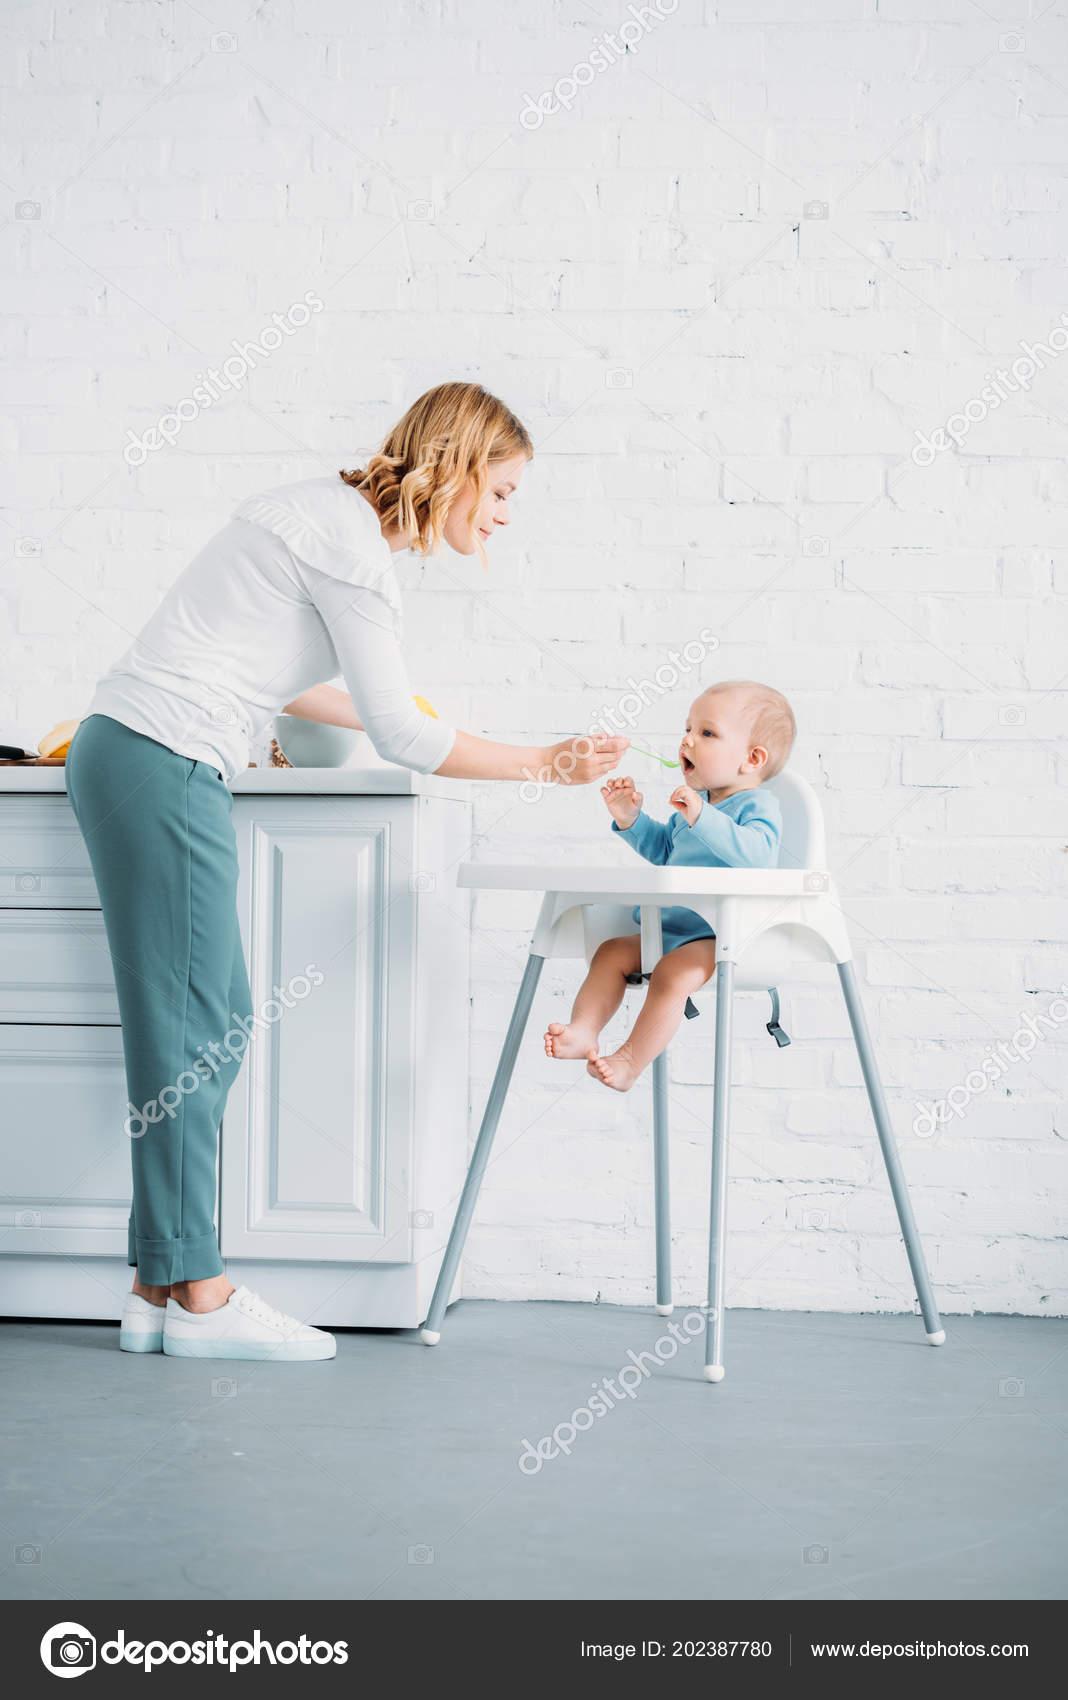 kitchen dining chairs menards kitchens 母亲喂养她的小孩而他坐在厨房的餐椅在家 图库照片 c andrewlozovyi 图库